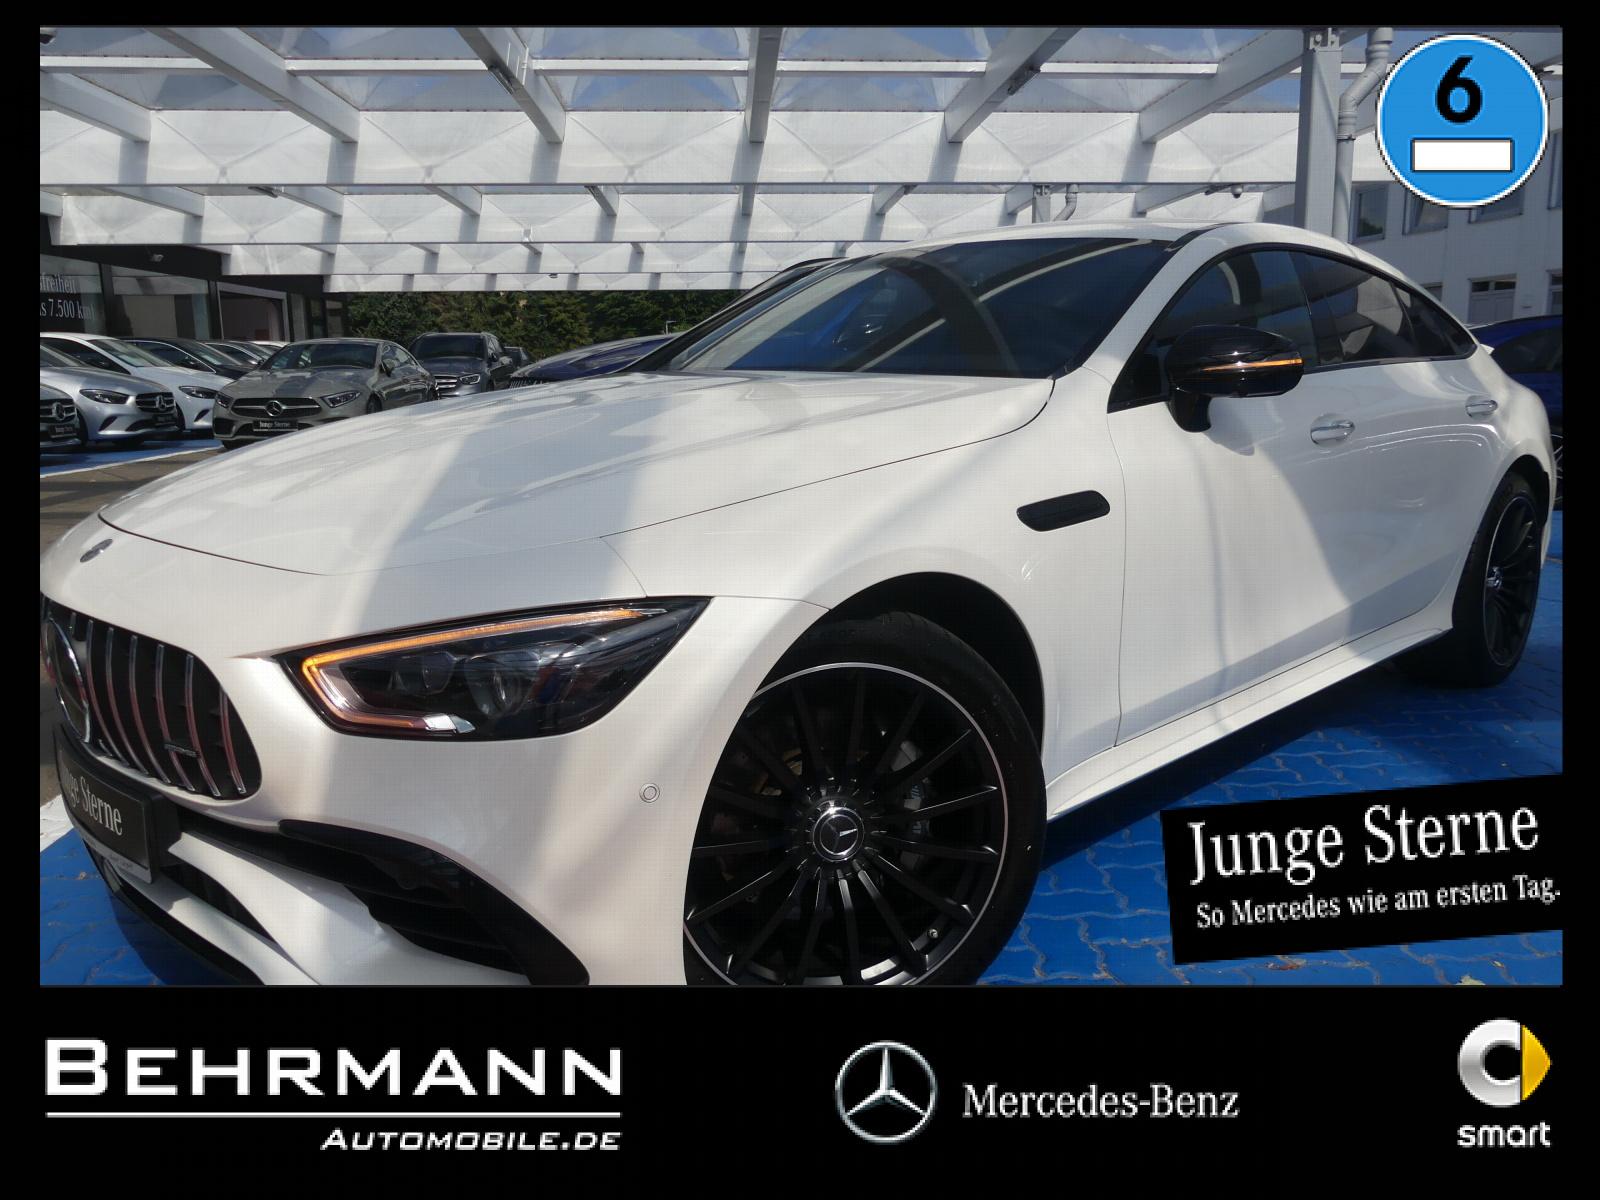 Mercedes-Benz AMG GT 43 4M+ ++Distronic+AHK+Burmester+HUD+LED+, Jahr 2020, Benzin